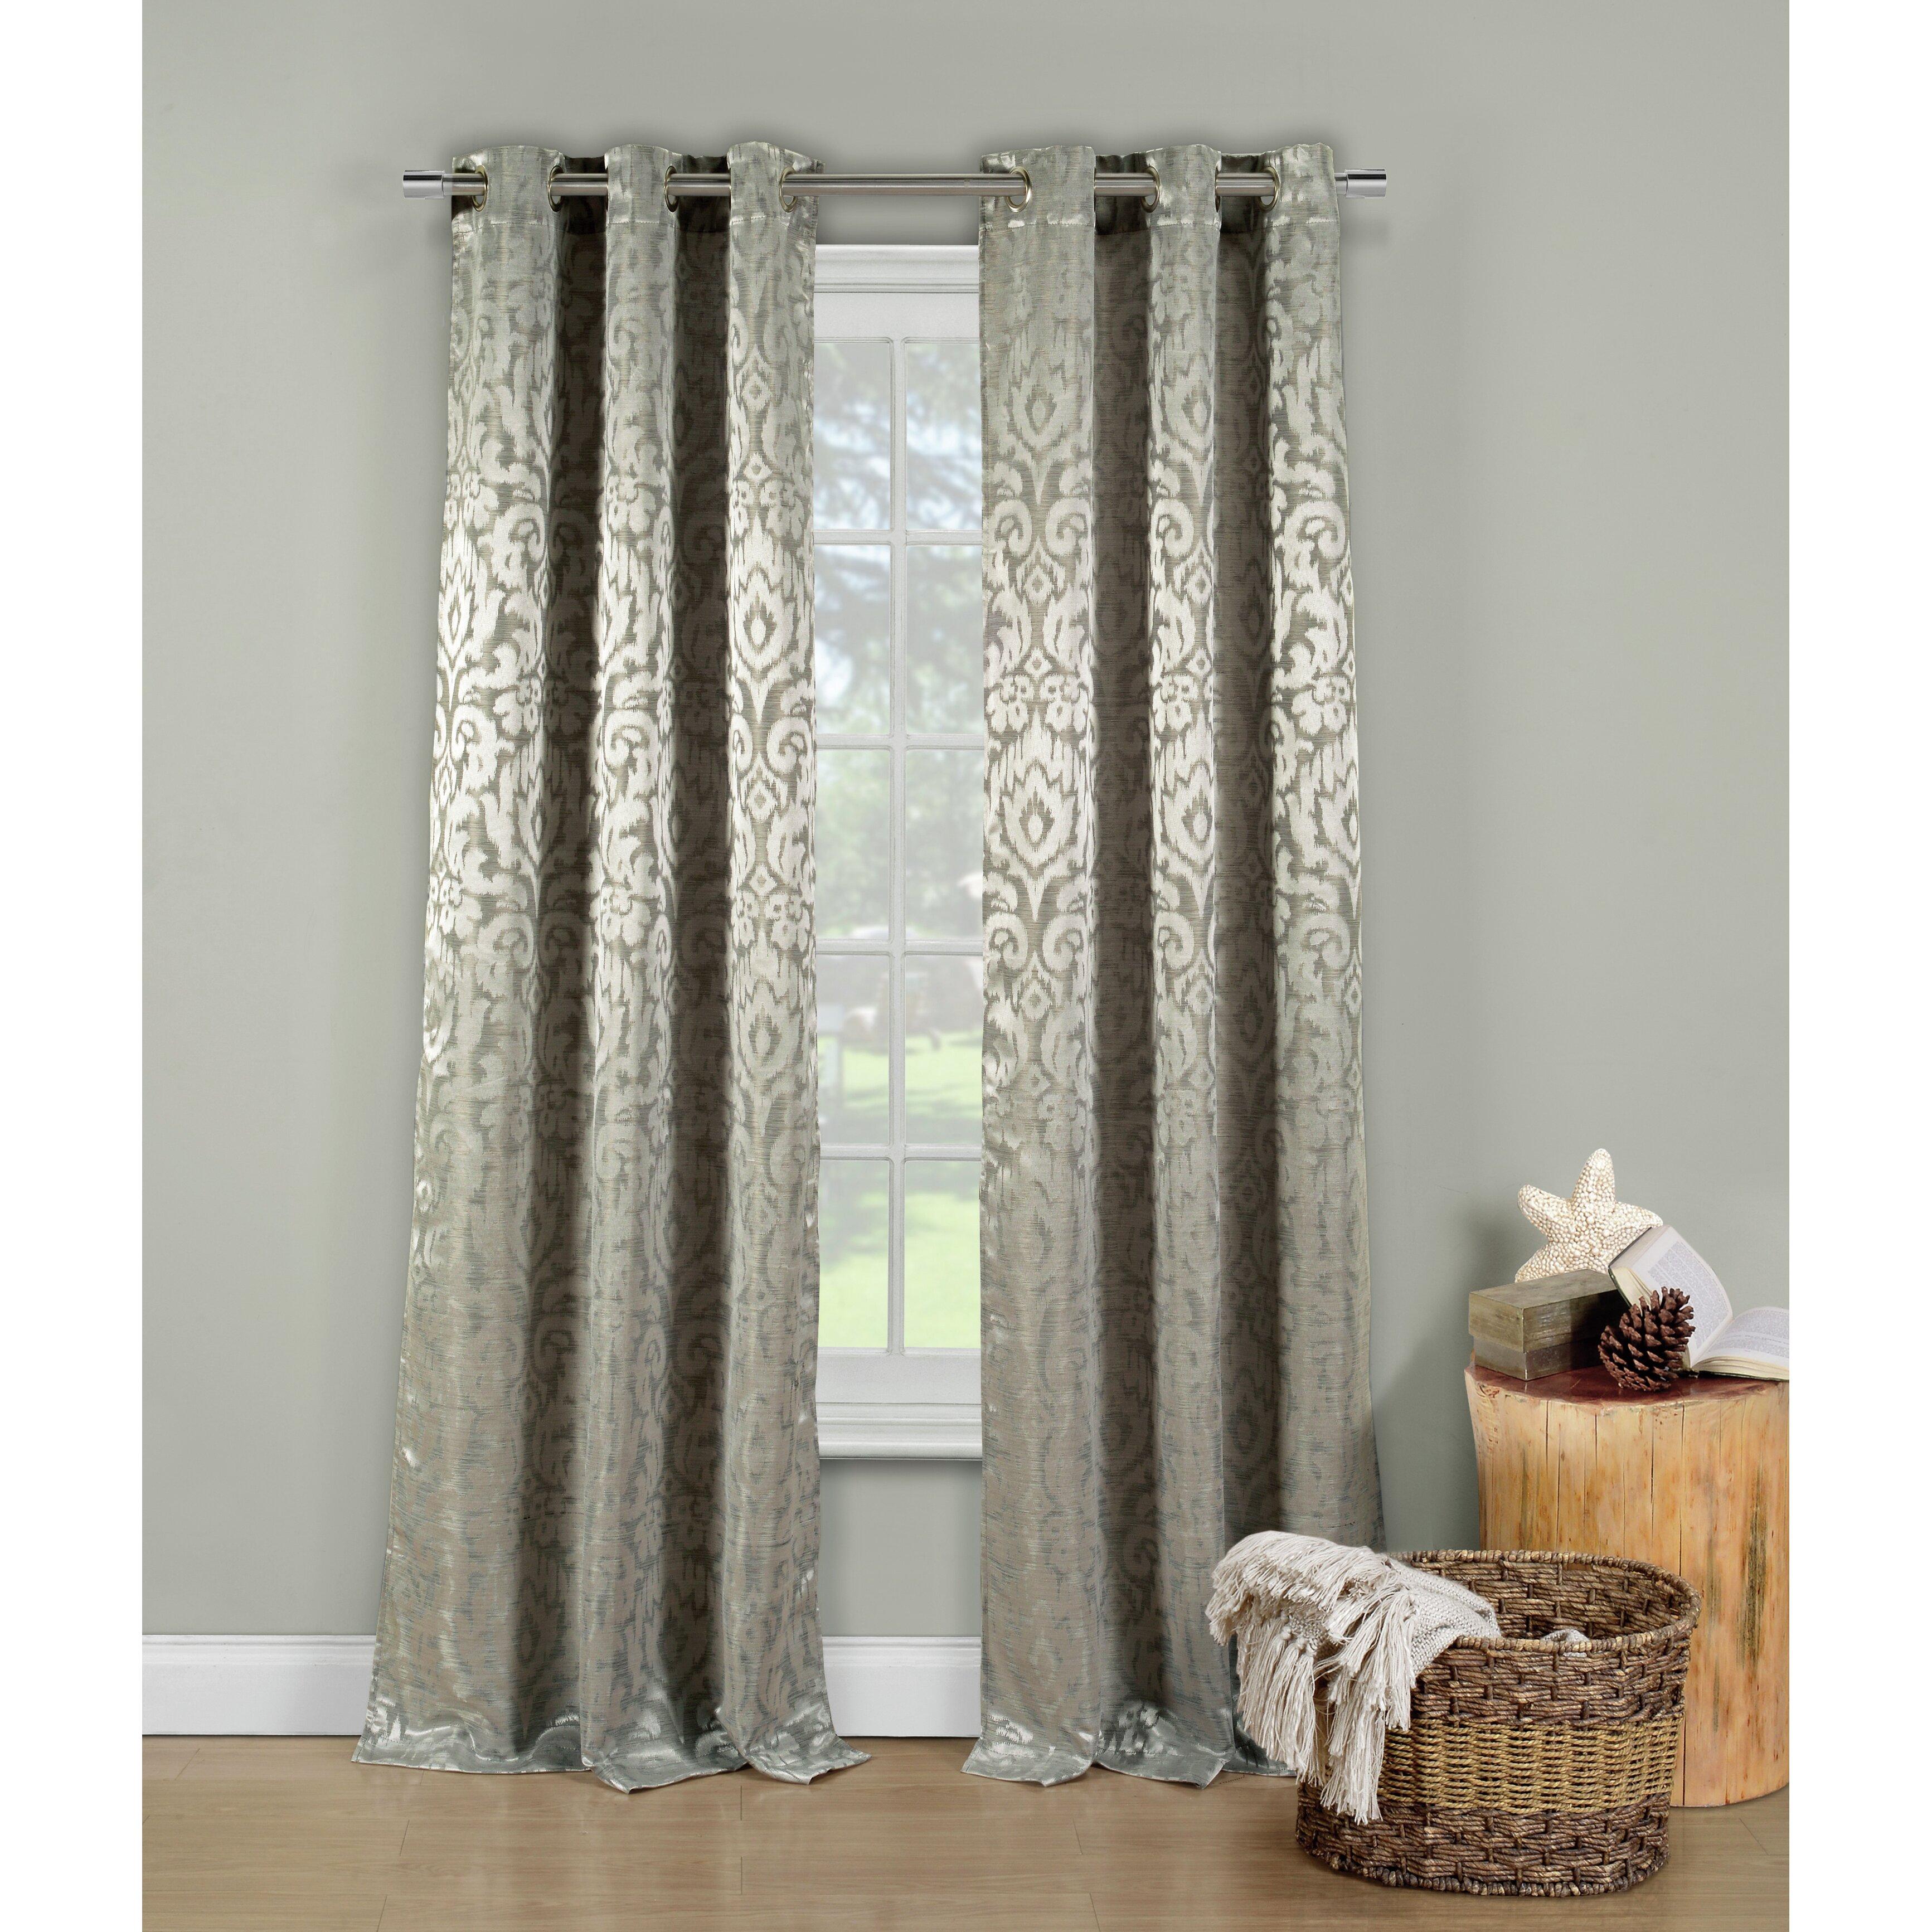 Lia curtain panel wayfair for International decor window treatments